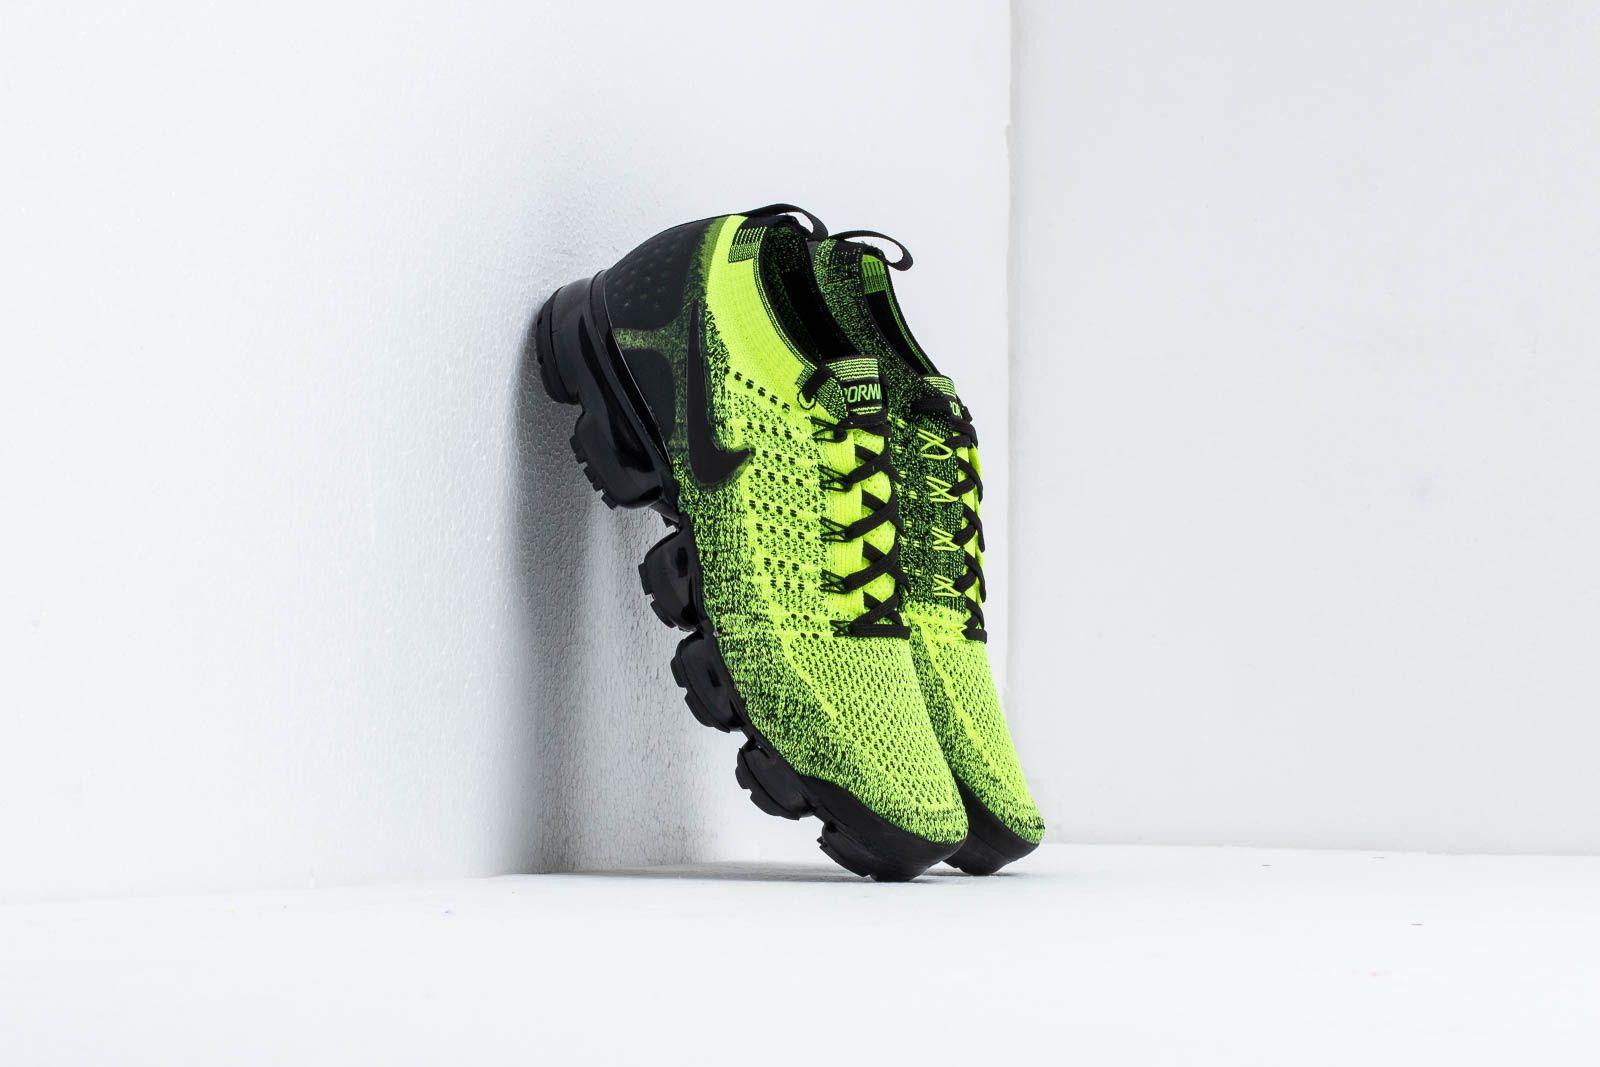 Nike Air Vapormax Flyknit 2 Volt  Black-Volt at a great price 198 € cc81edd0b